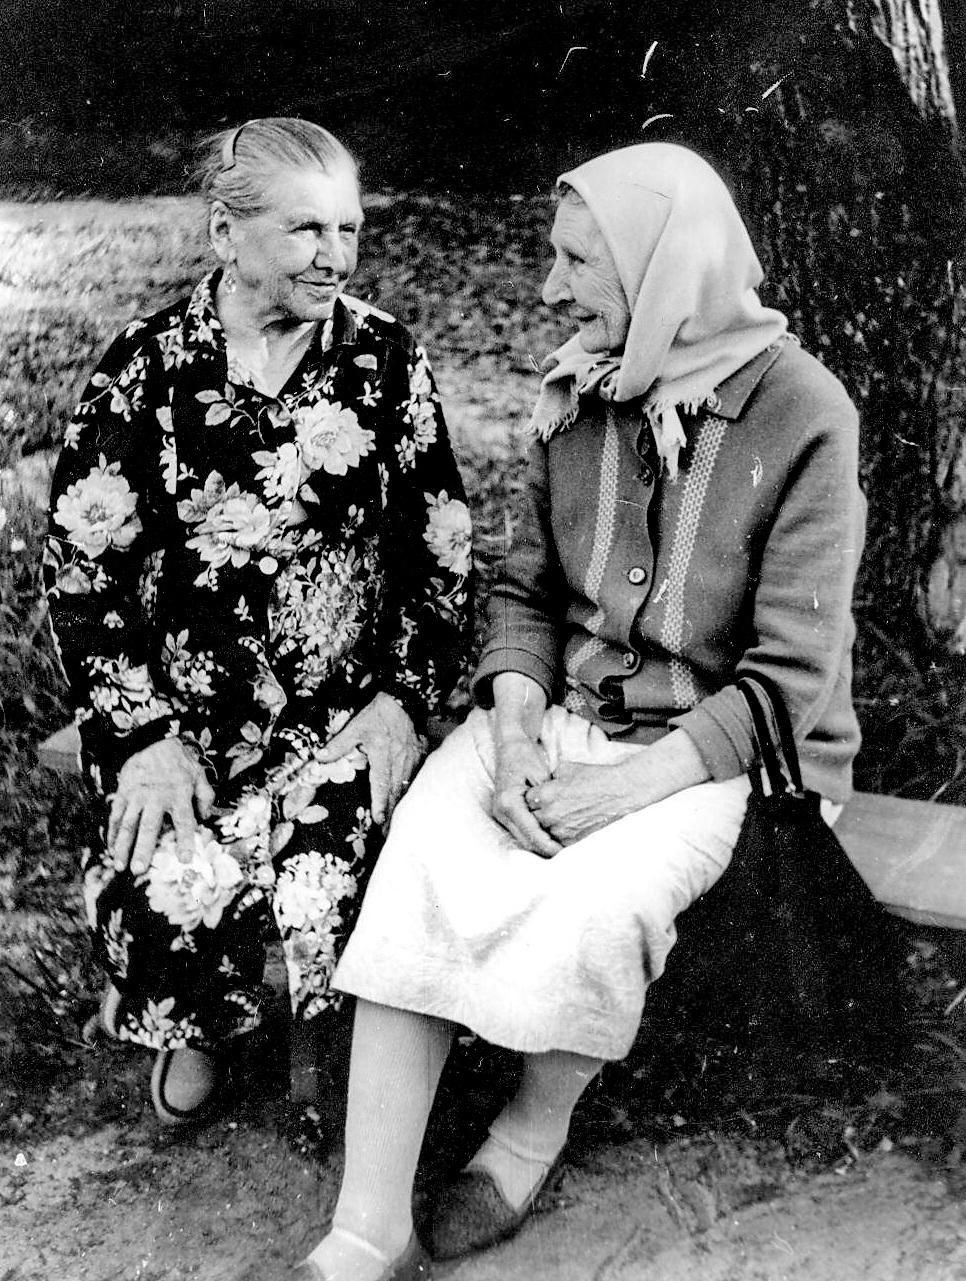 бабушка с соседкой июнь 1988.jpg